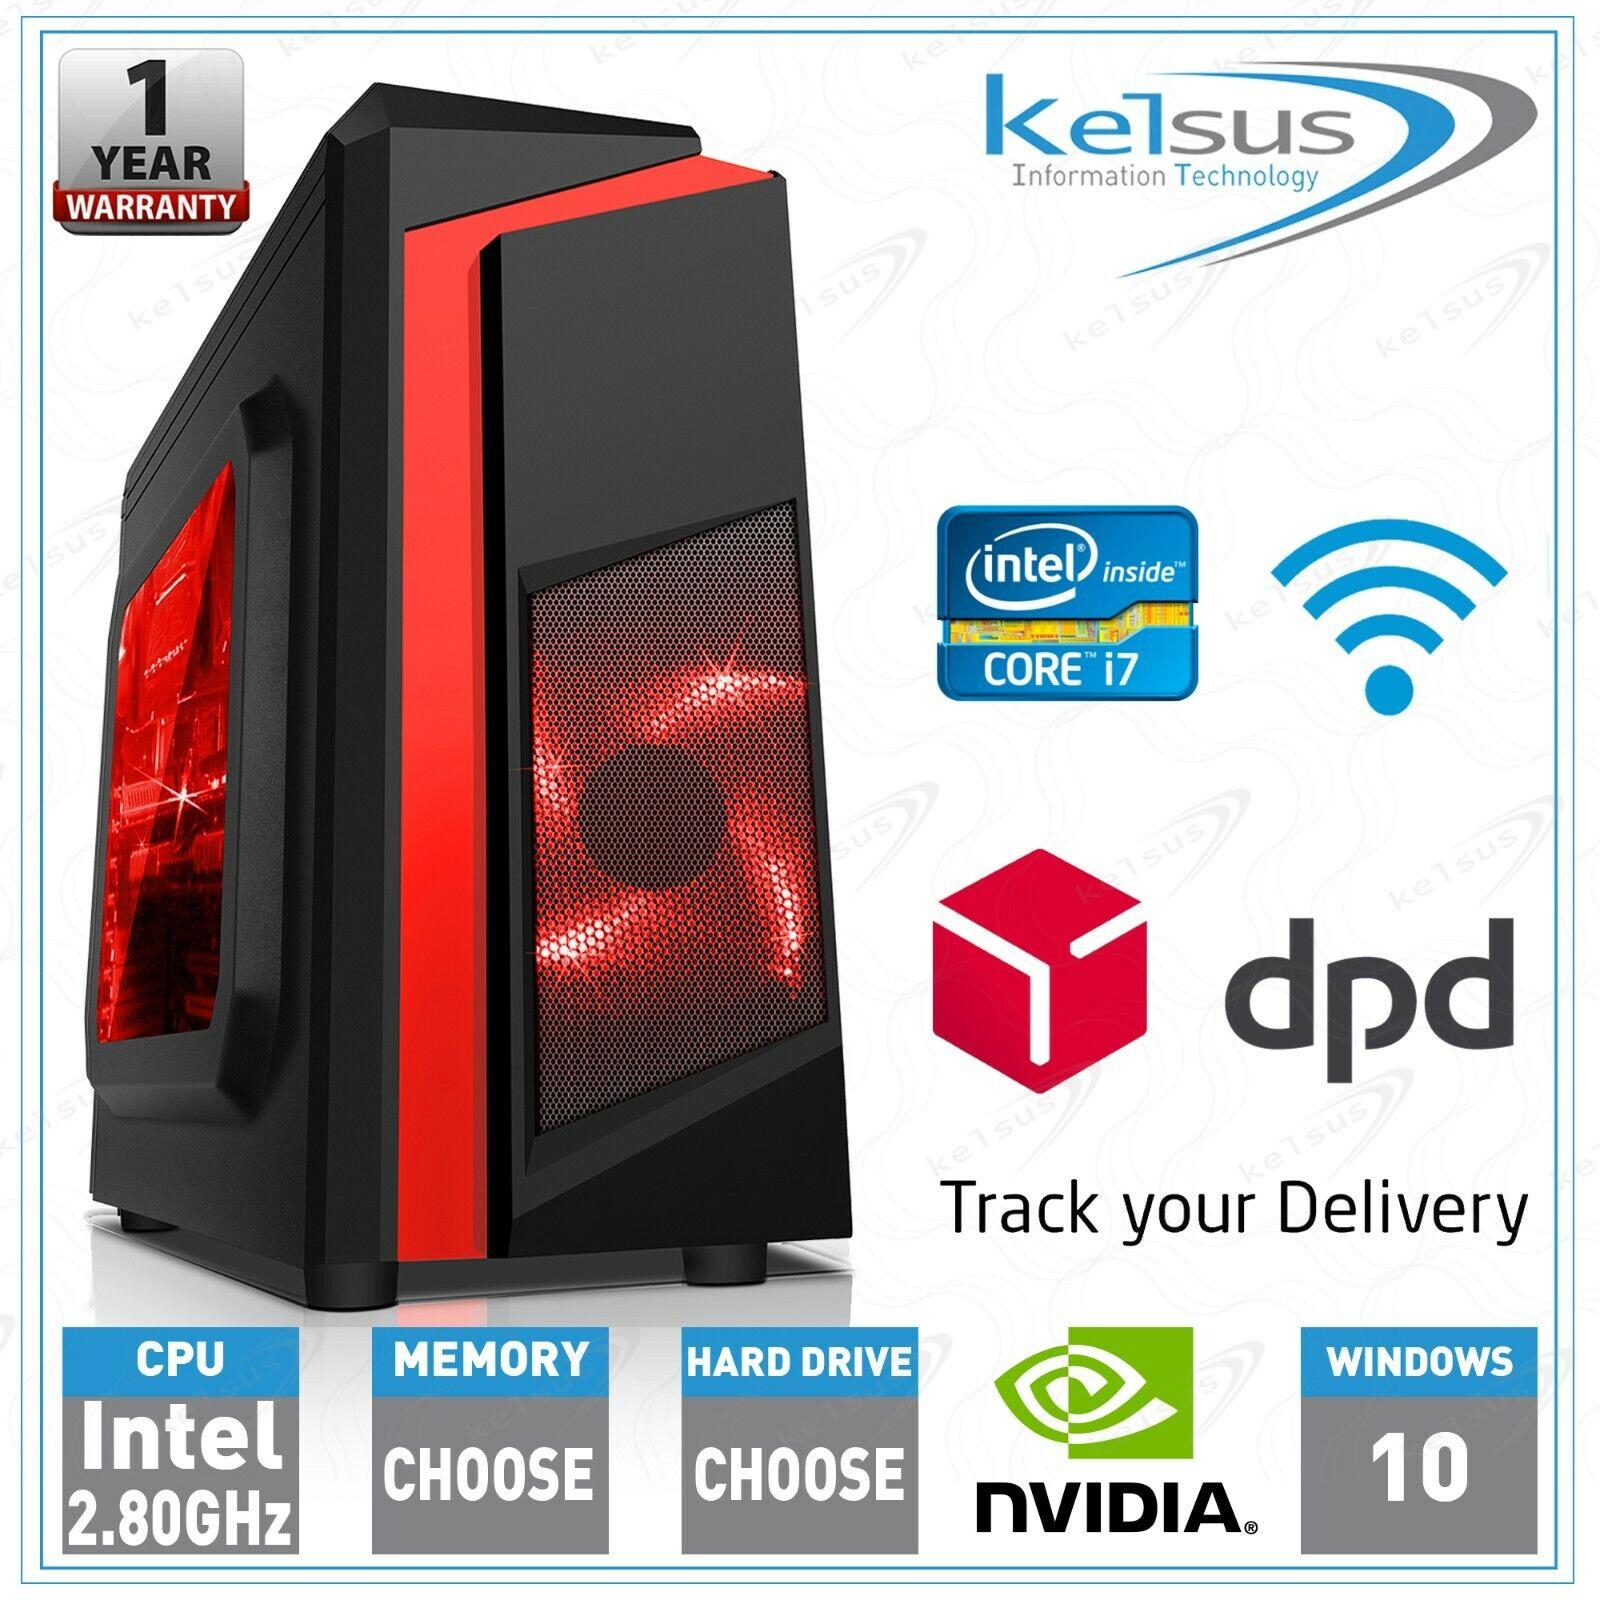 Computer Games - Fast Gaming PC Computer 8GB 16GB RAM HDD SSD Nvidia GT 710 GTX 1650 Windows 10